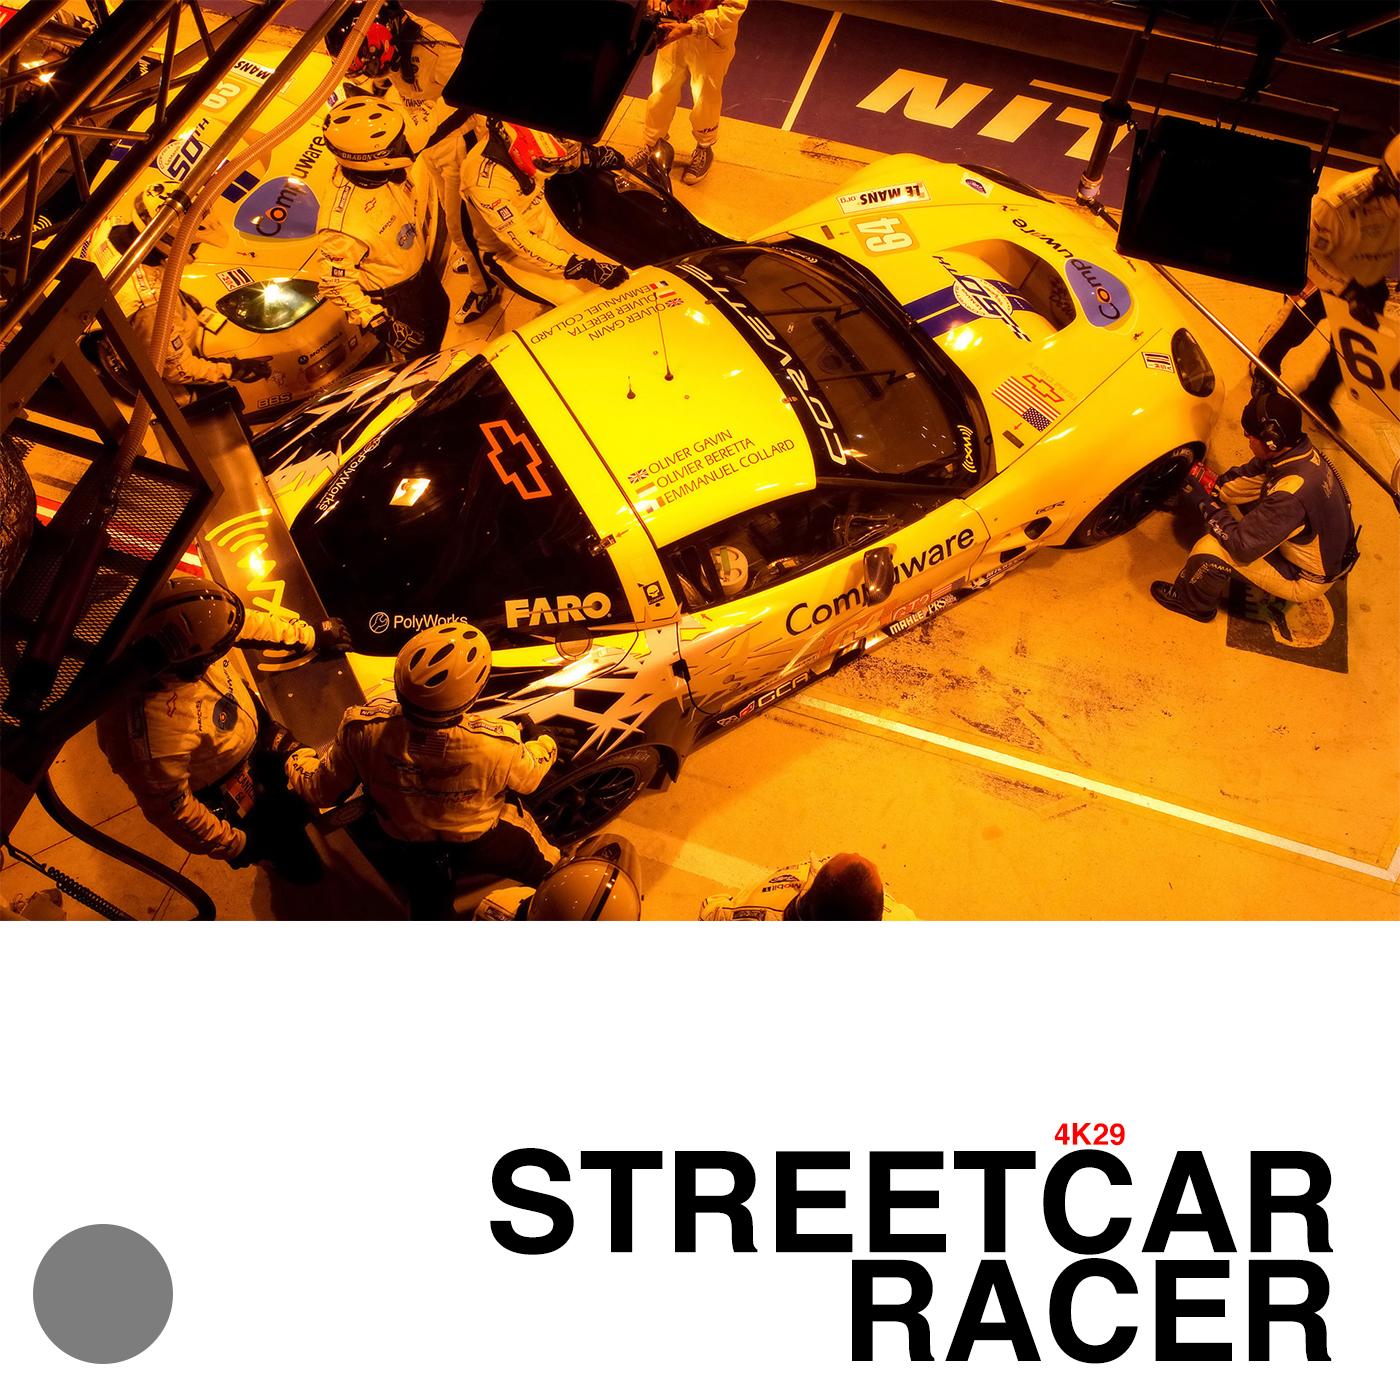 STREETCAR RACER 4K29